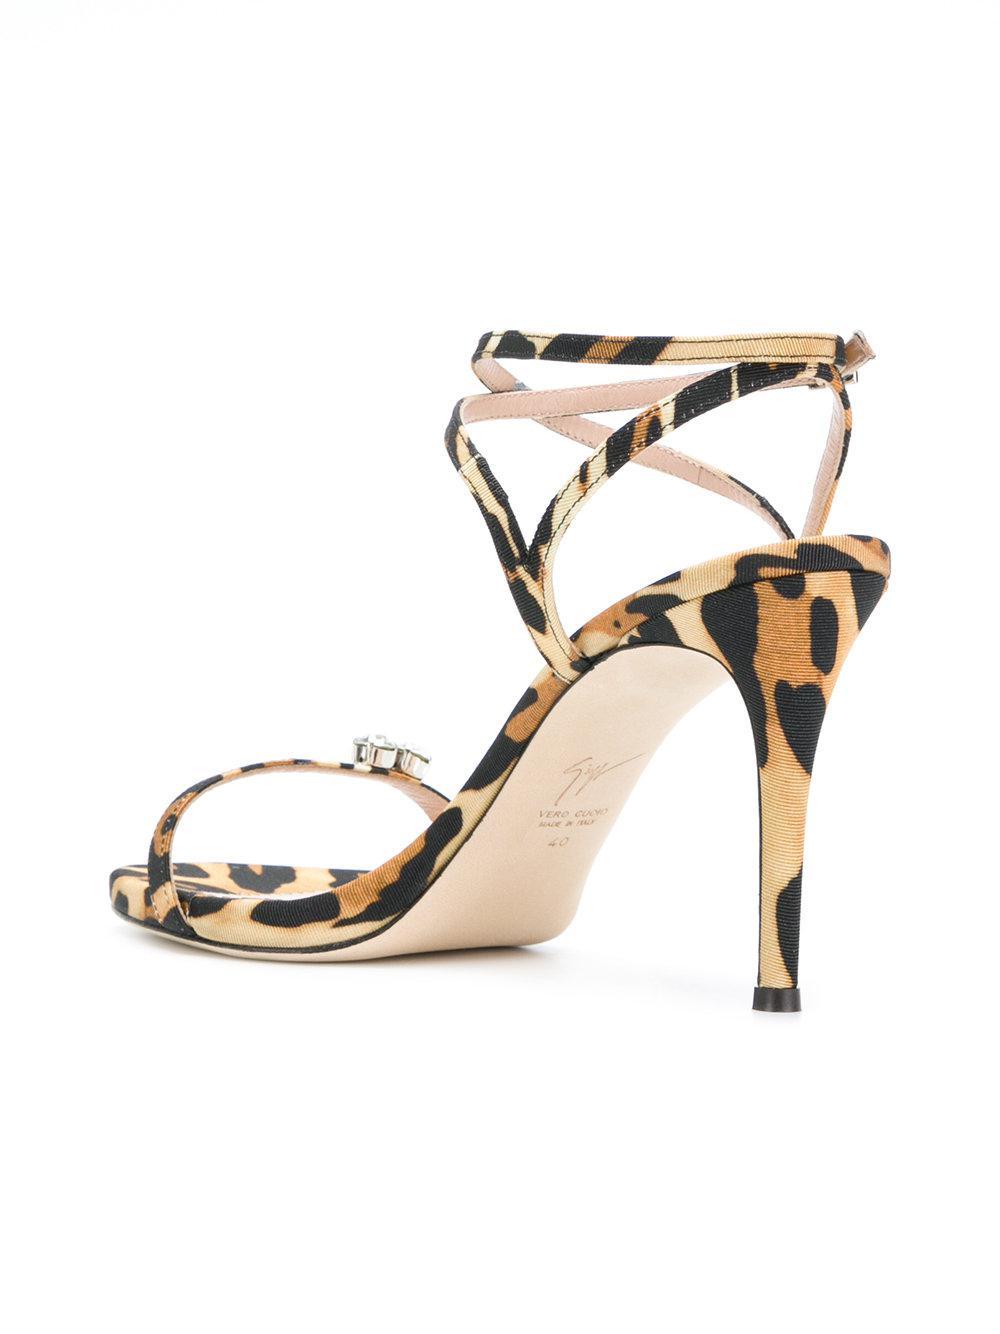 rhinestone detail strappy mid heel sandal - Black Giuseppe Zanotti 4iC87